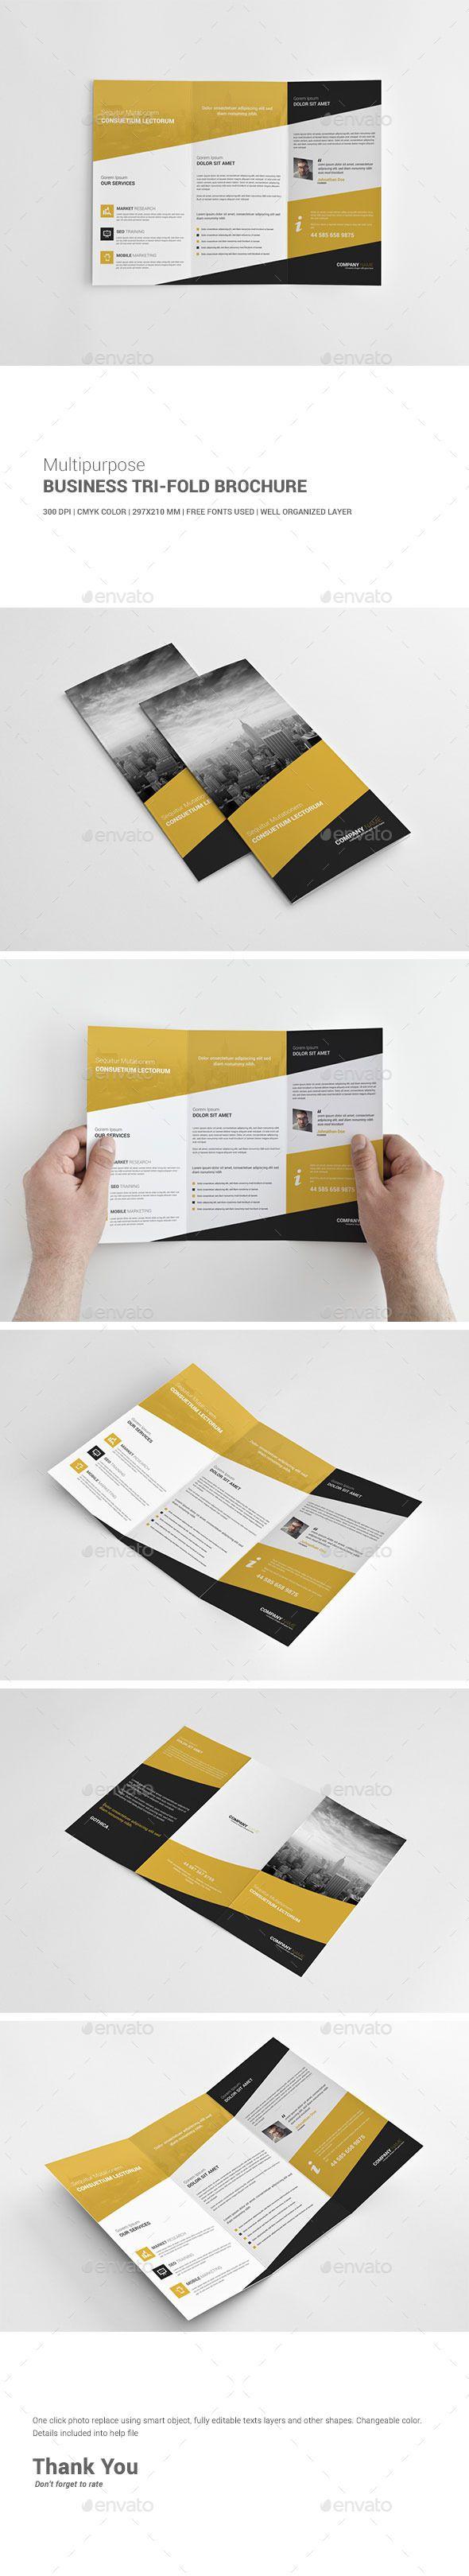 Multipurpose Business Tri-Fold Brochure - Corporate Brochure Template PSD. Download here: http://graphicriver.net/item/multipurpose-business-trifold-brochure/12736863?s_rank=1794&ref=yinkira